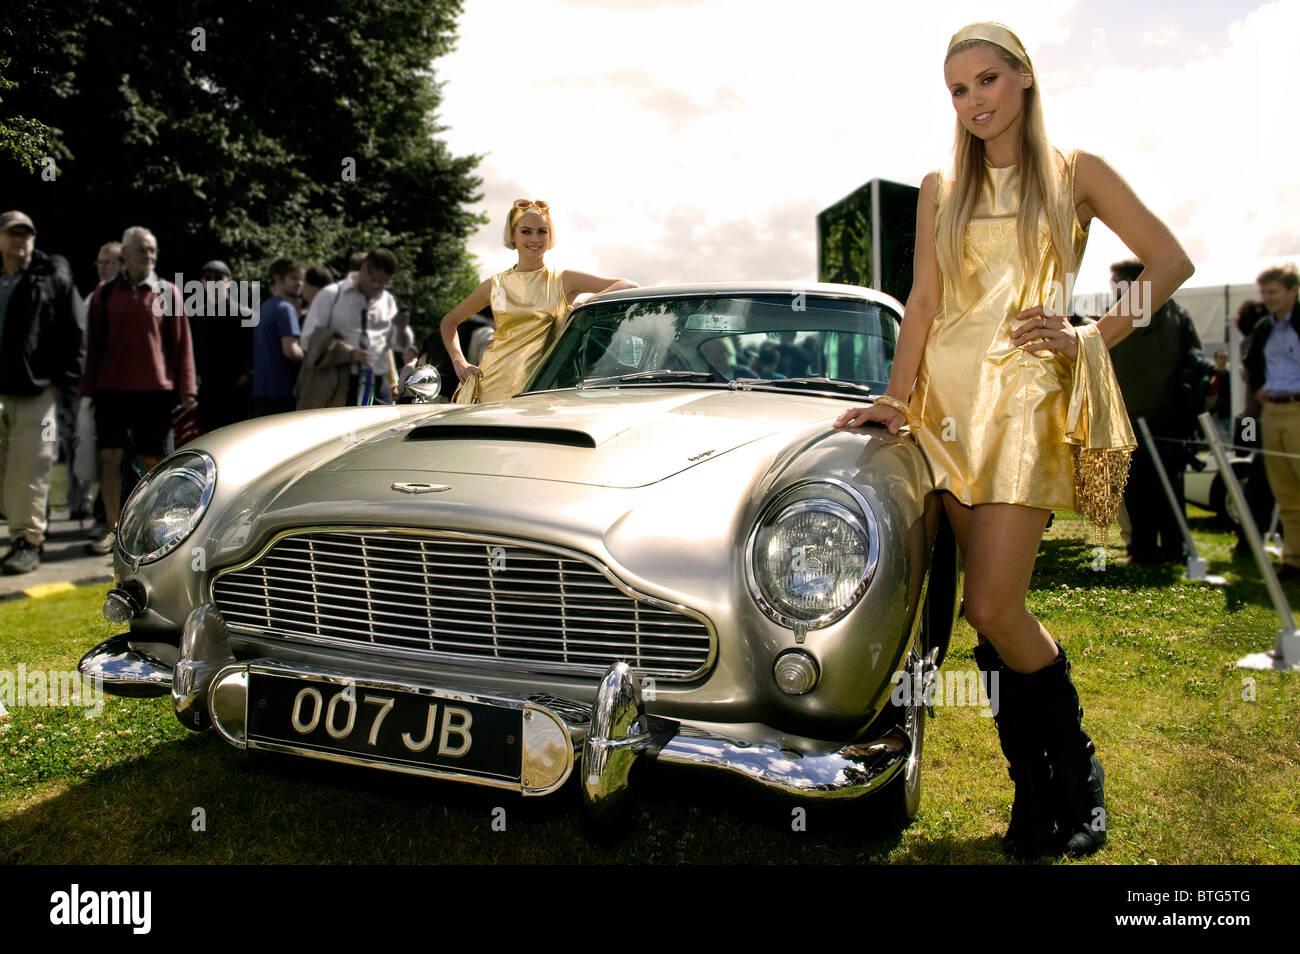 James Bond 007 Aston Martin DB5 Immagini Stock